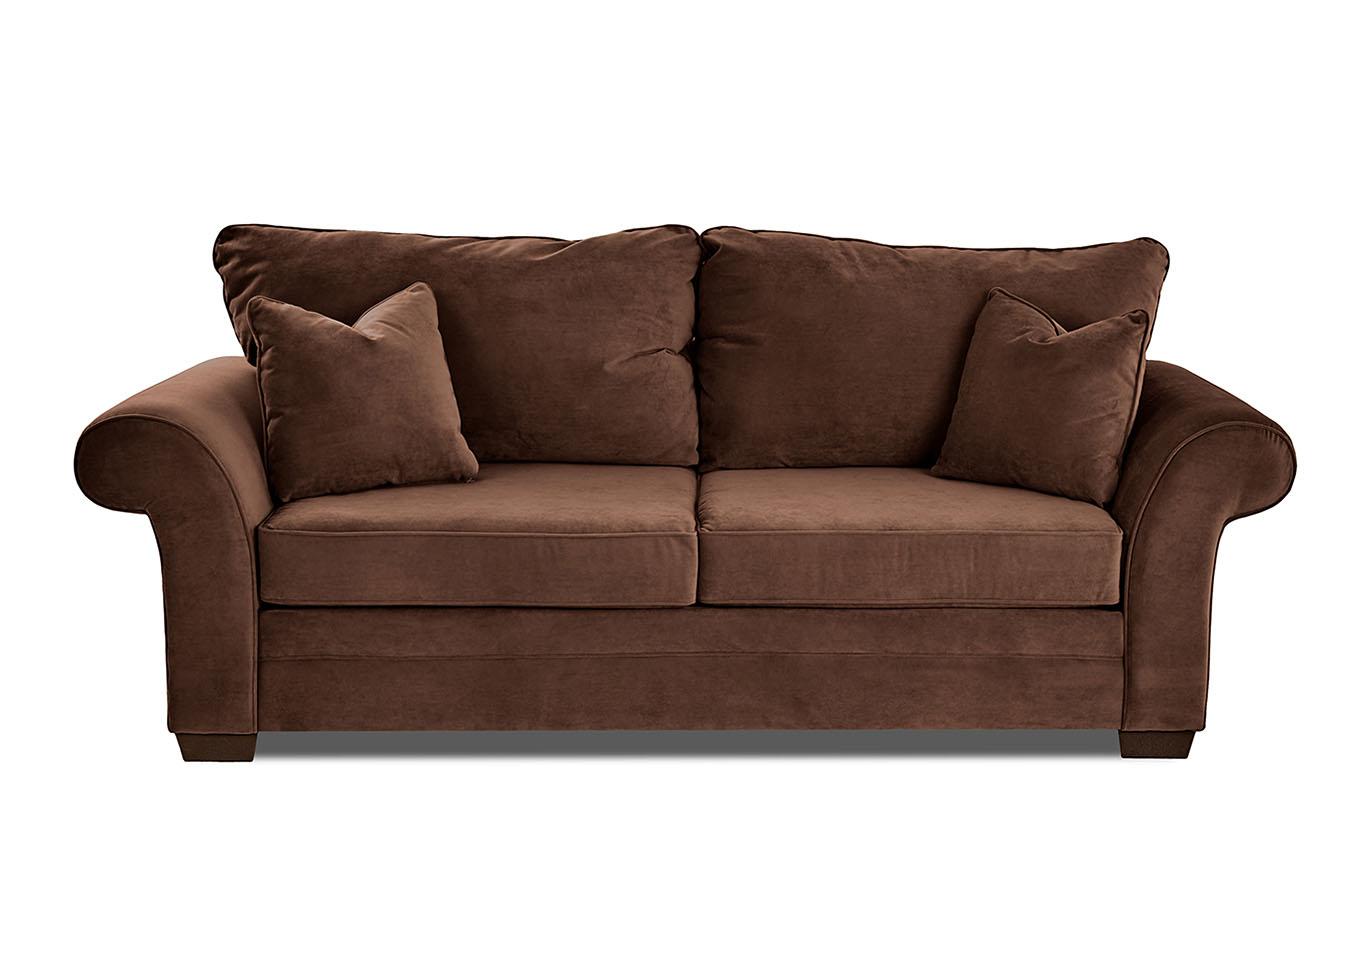 Holly Dark Brown Stationary Fabric Sofa,Klaussner Home Furnishings